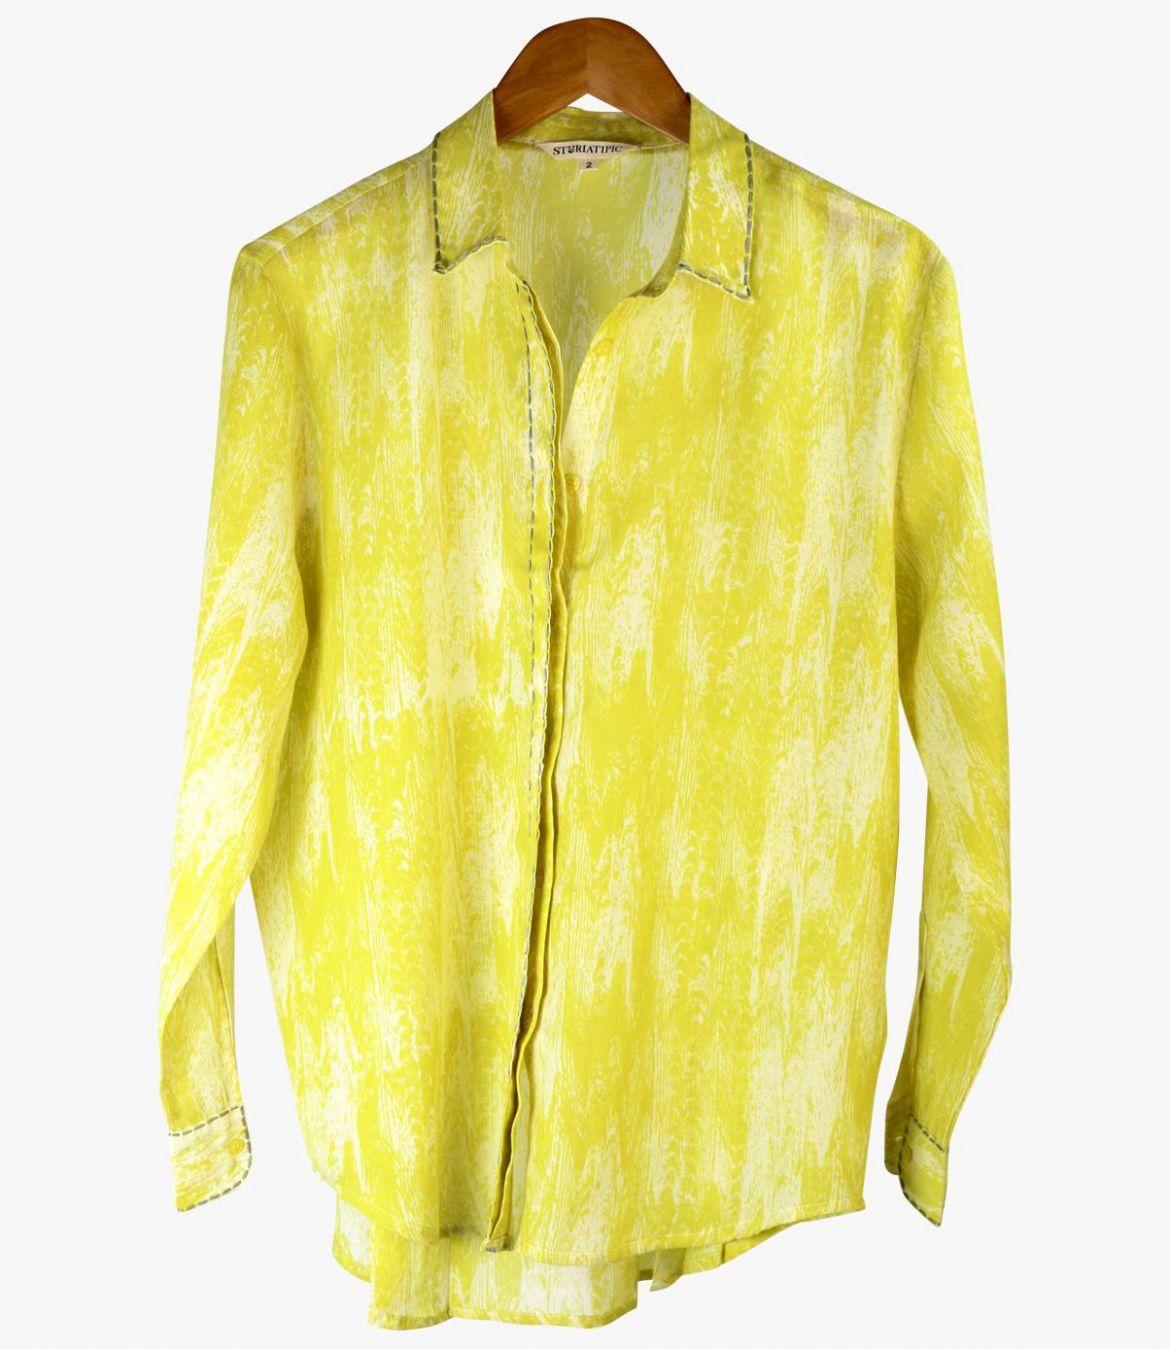 CARI MOIRA Cotton Shirt for Women Storiatipic - 1